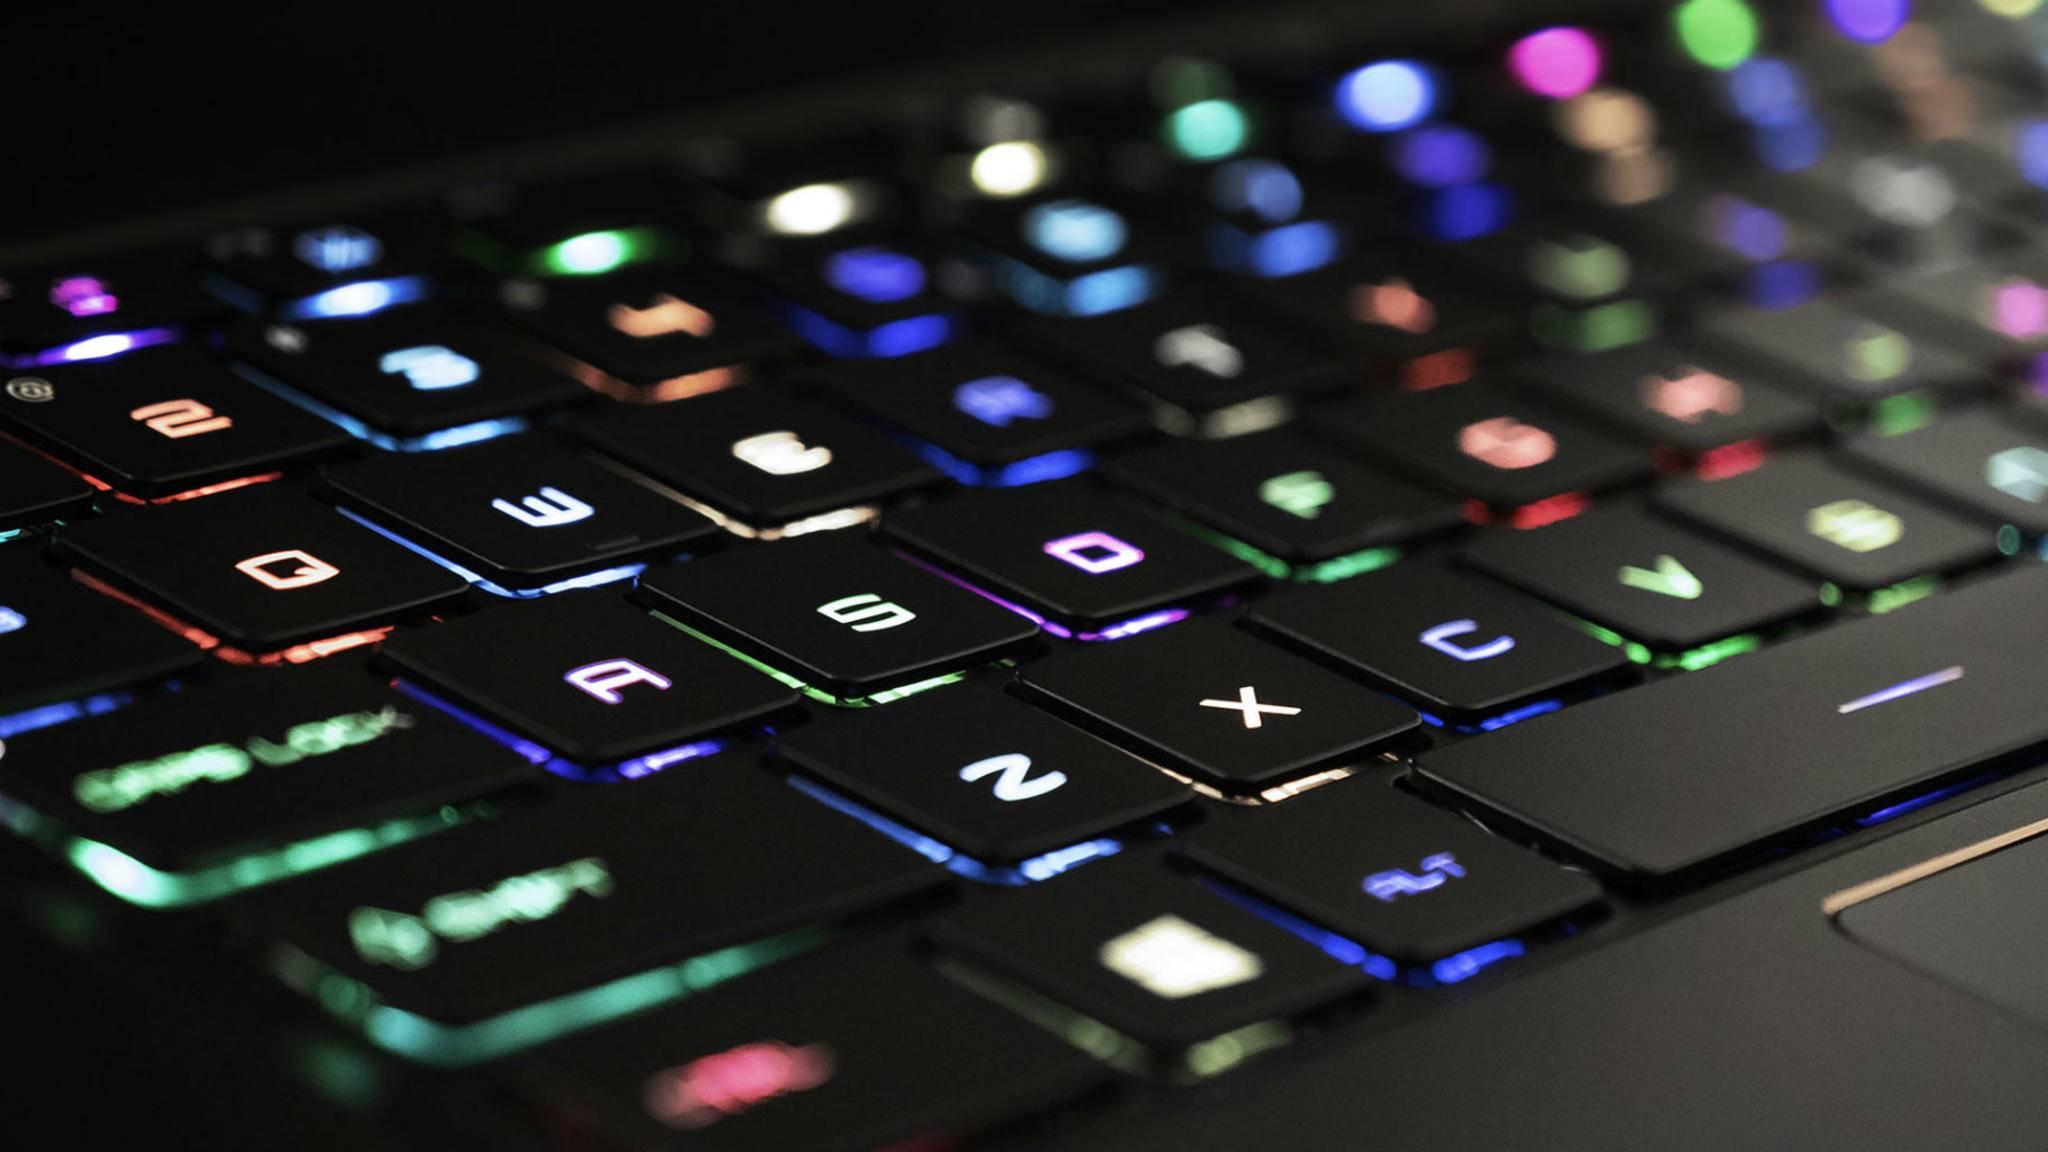 Stellt Nvidia bald RTX-Modelle für Gaming-Laptops vor?